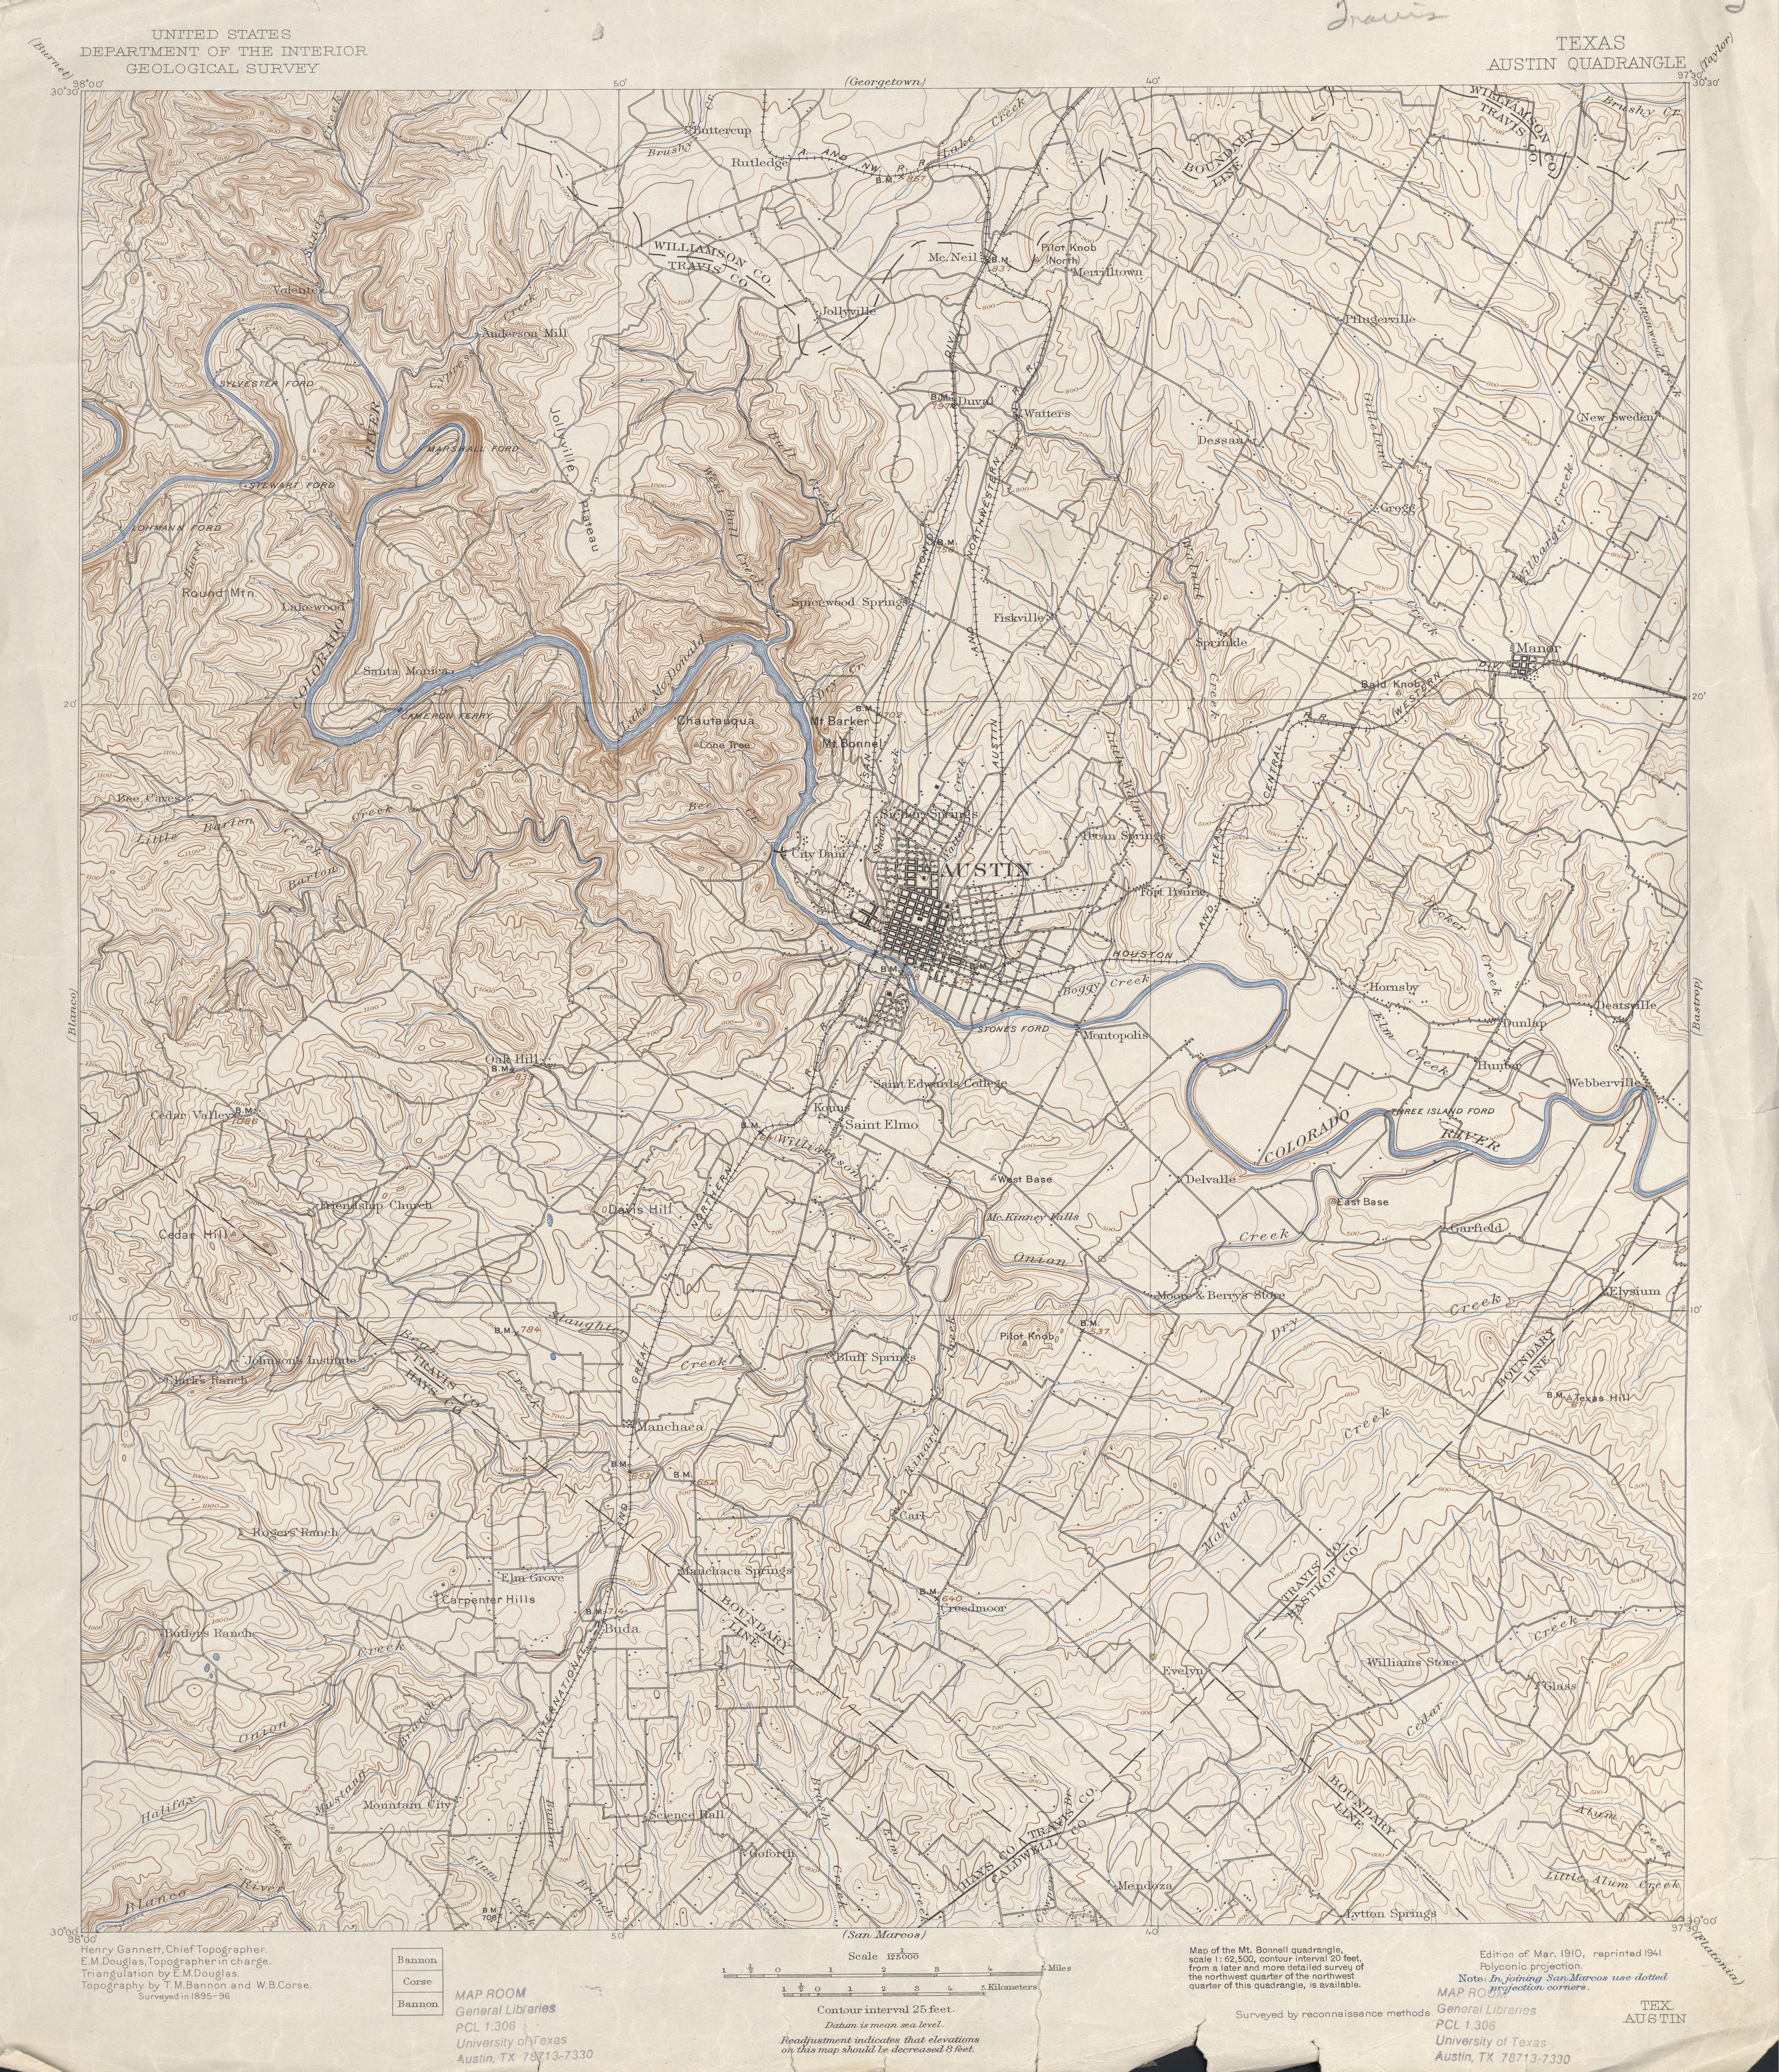 1910 USGS topographic map - Austin